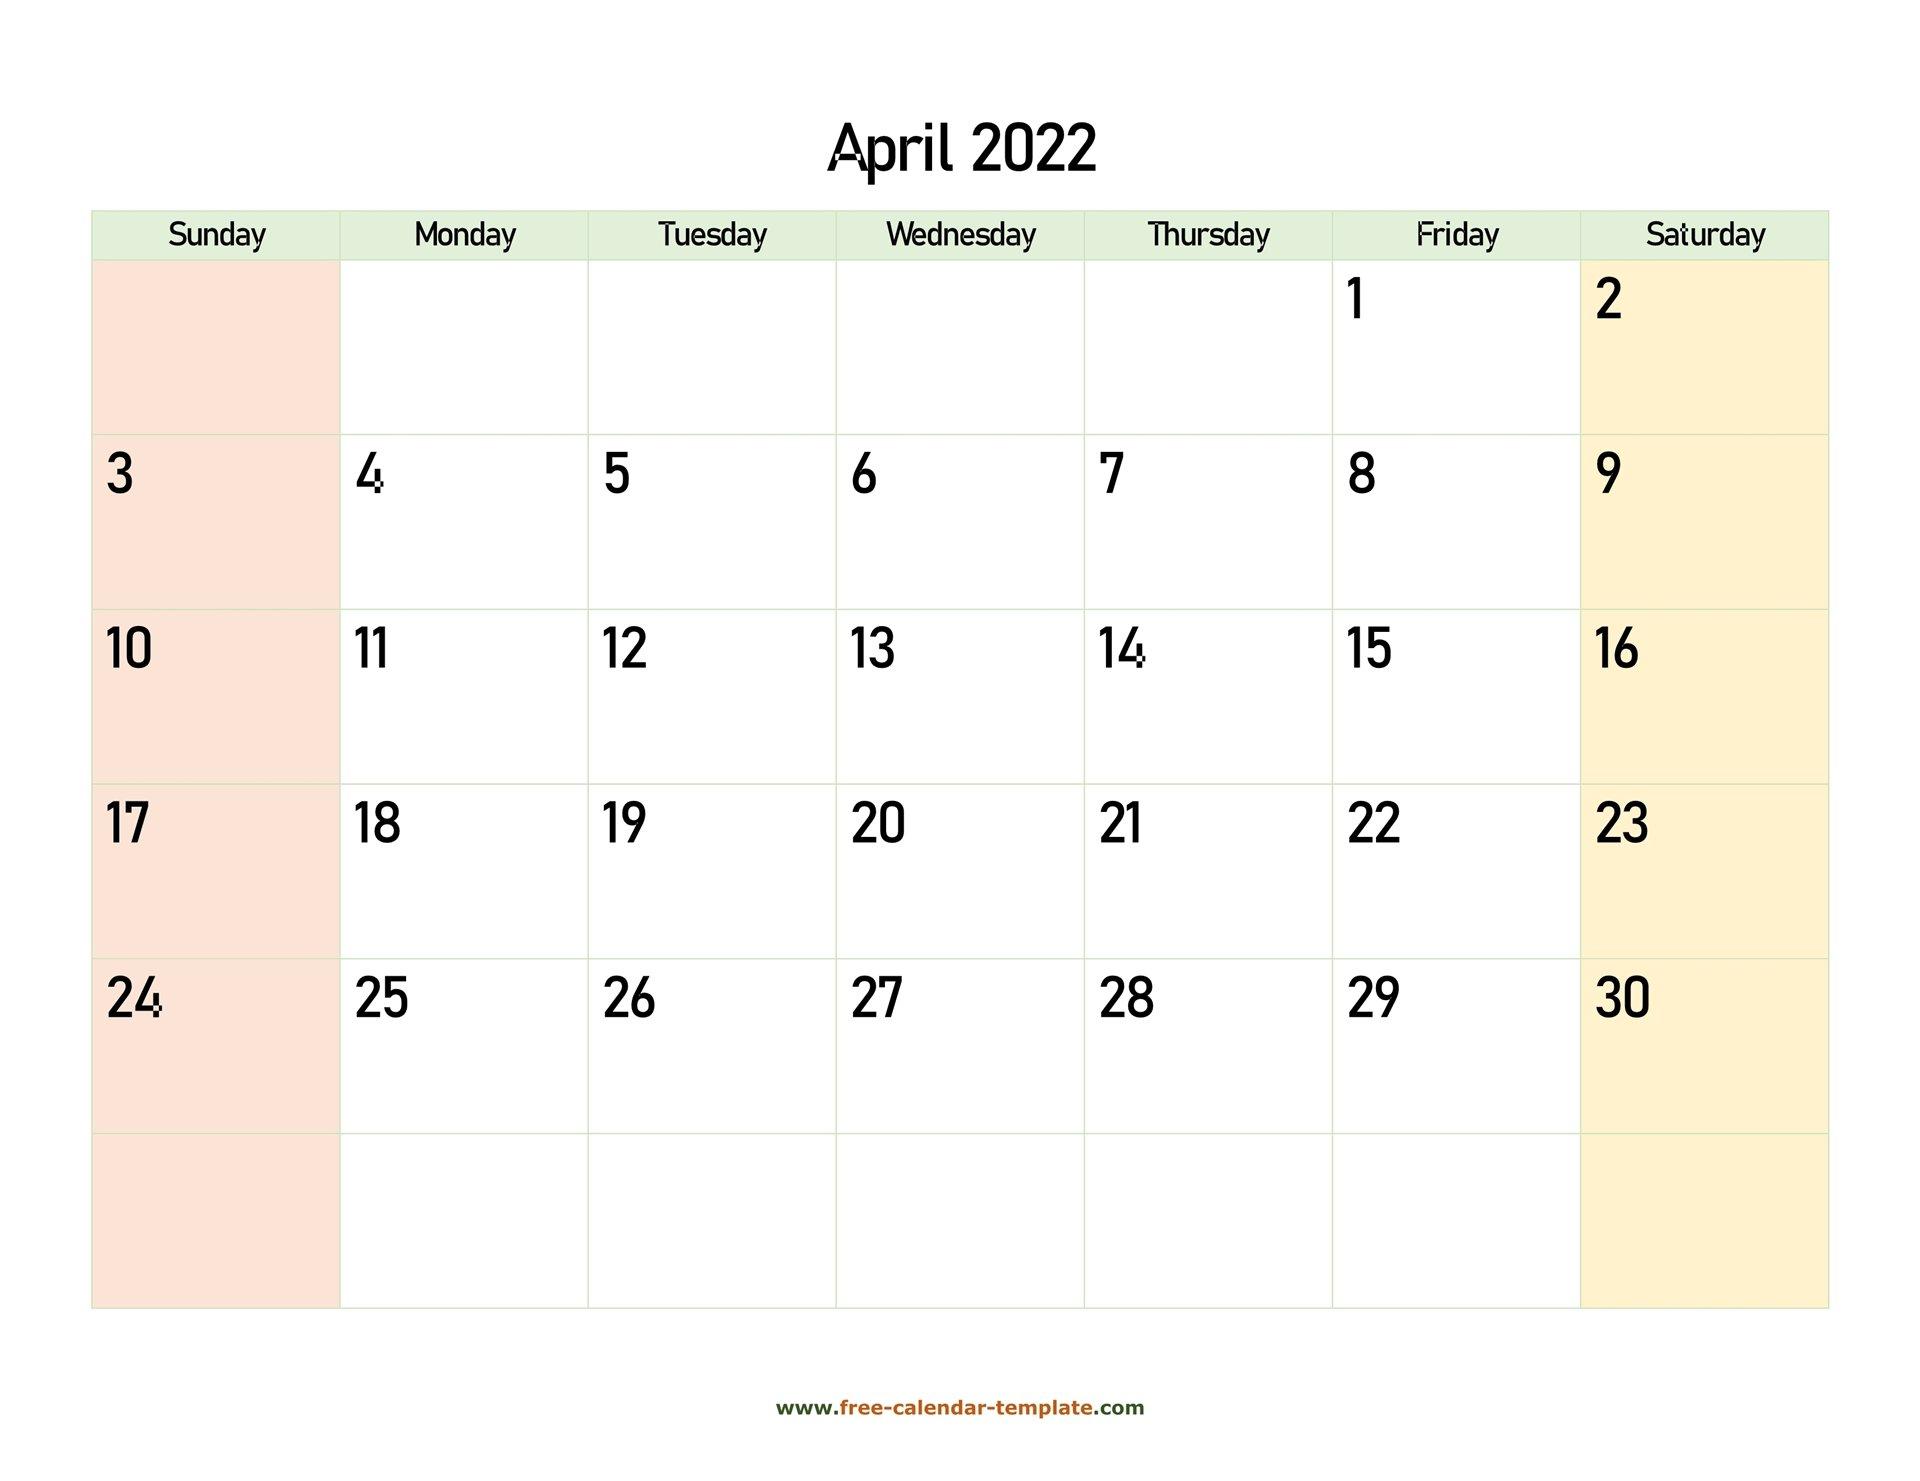 April 2022 Free Calendar Tempplate | Free-Calendar for April May Calendar 2022 Photo